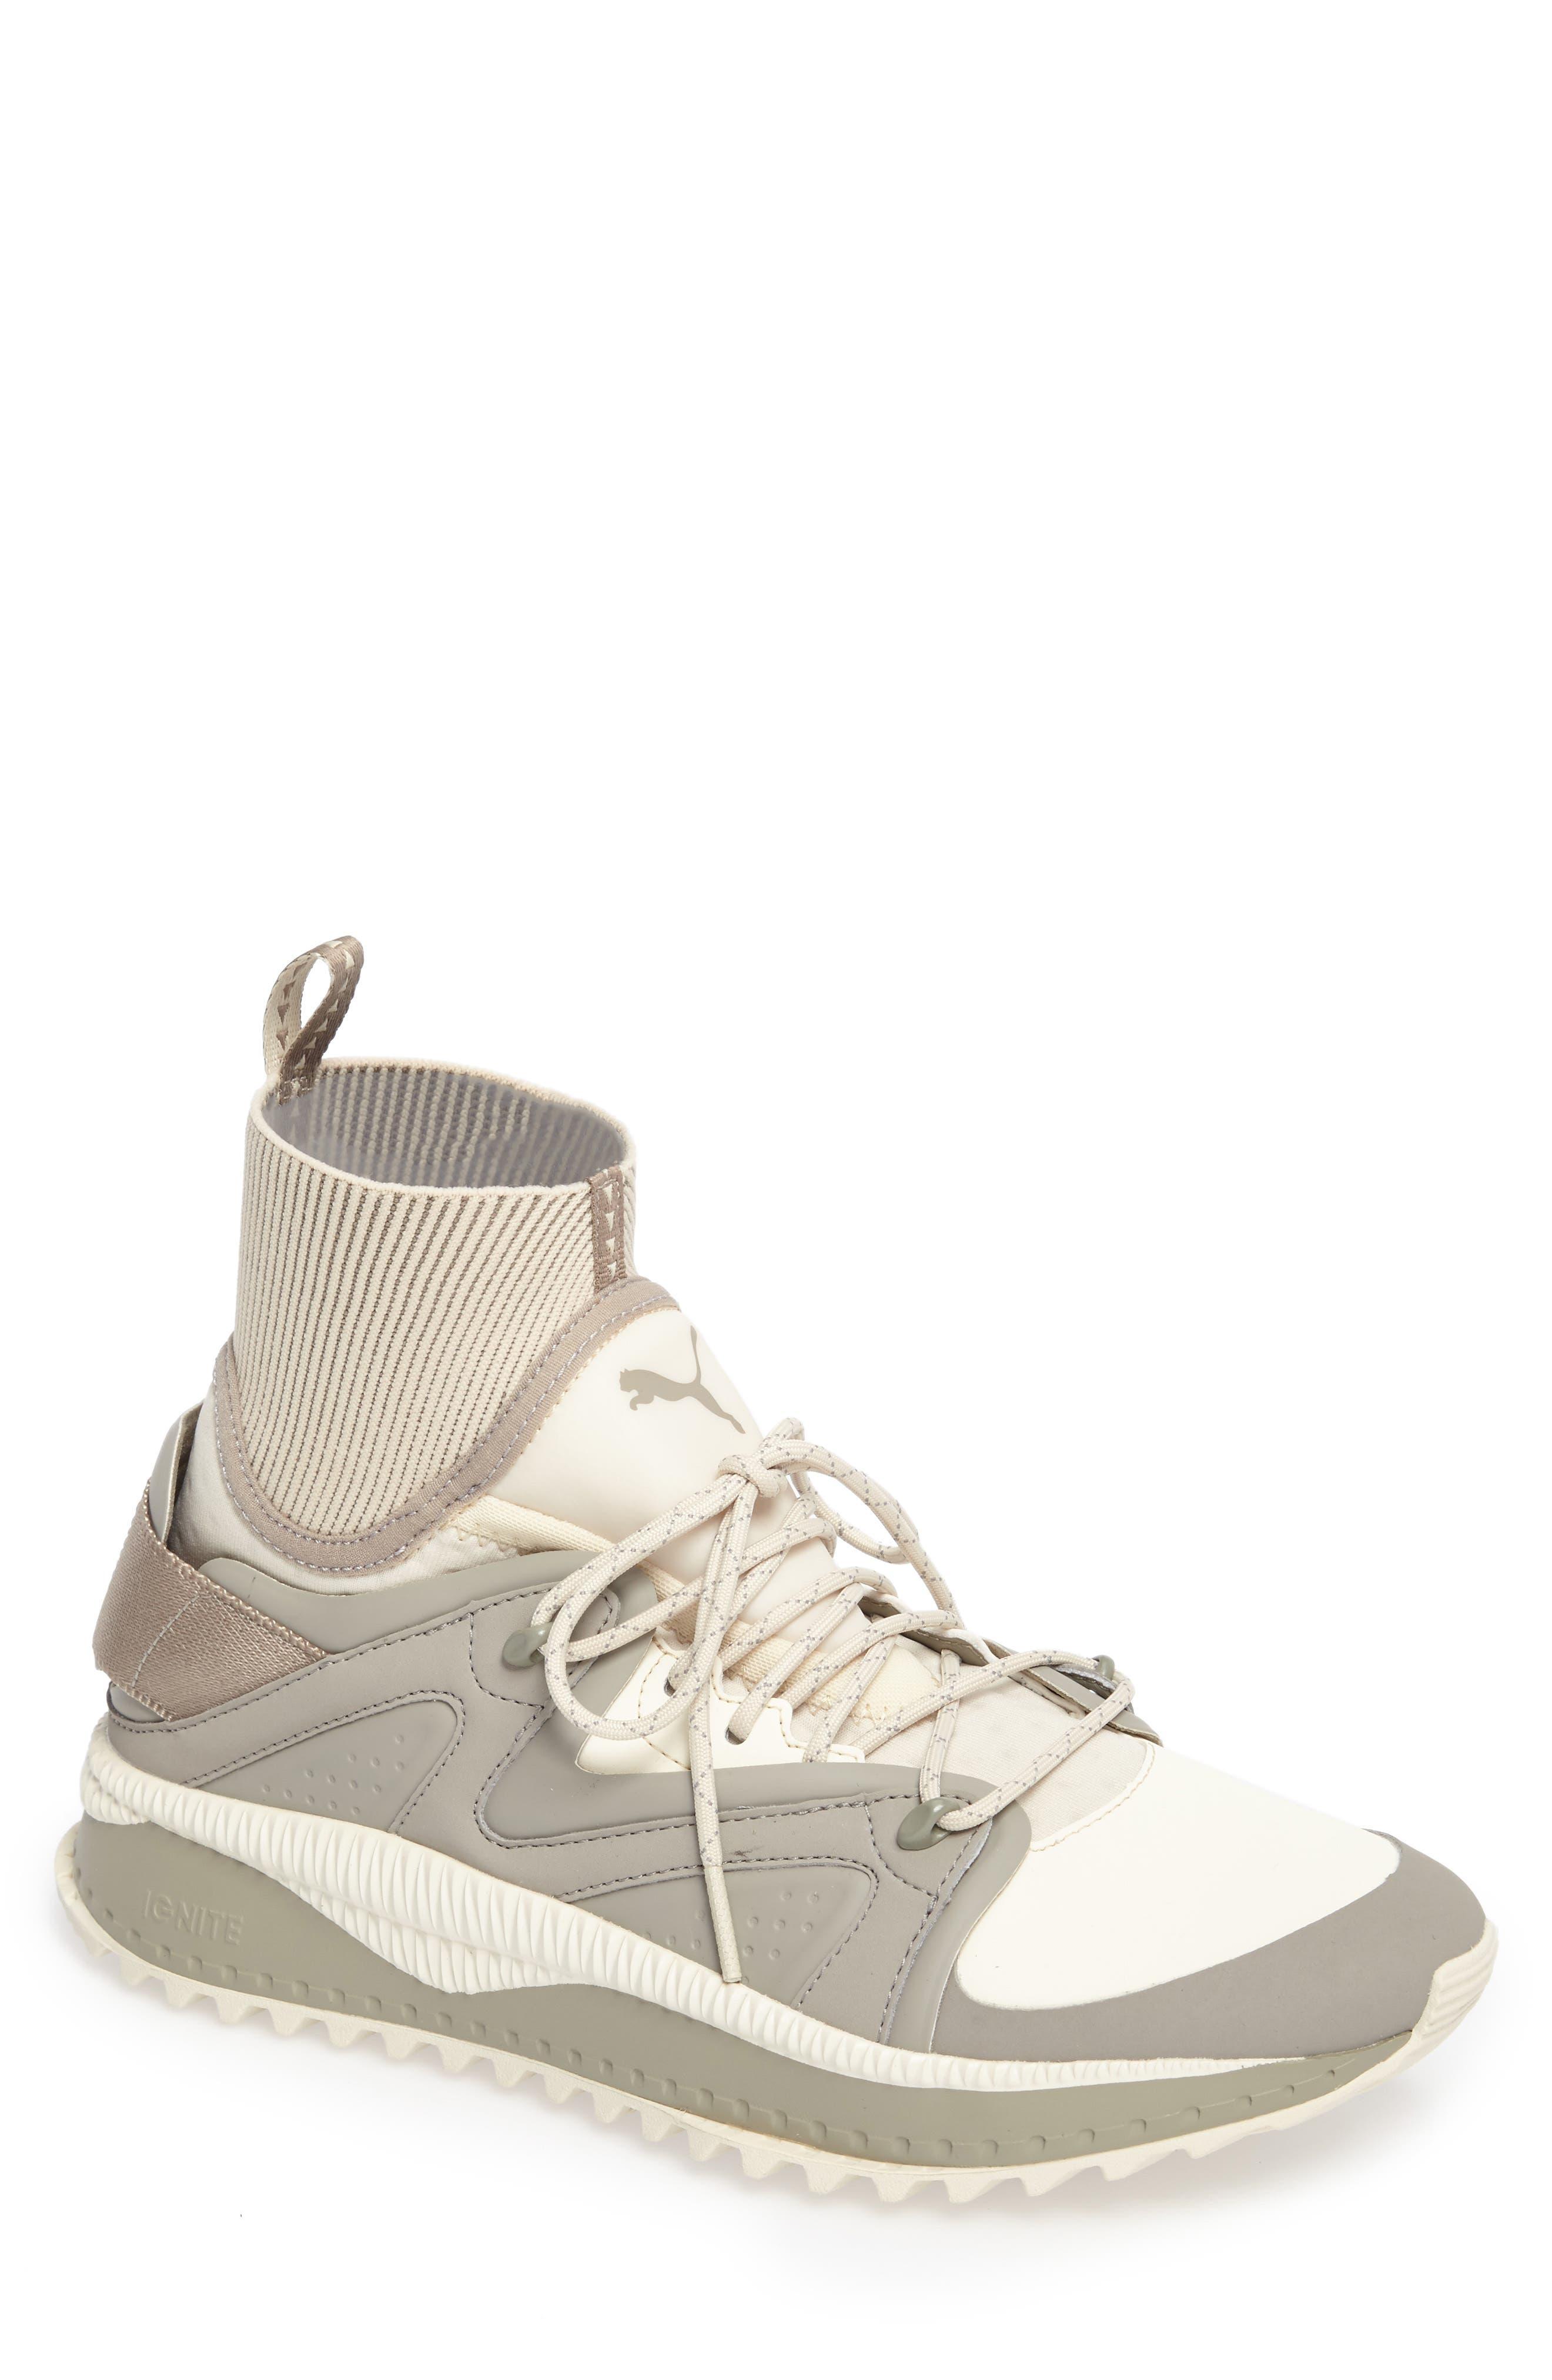 Tsugi Kori Sneaker,                             Main thumbnail 1, color,                             Rock Ridge/ Birch